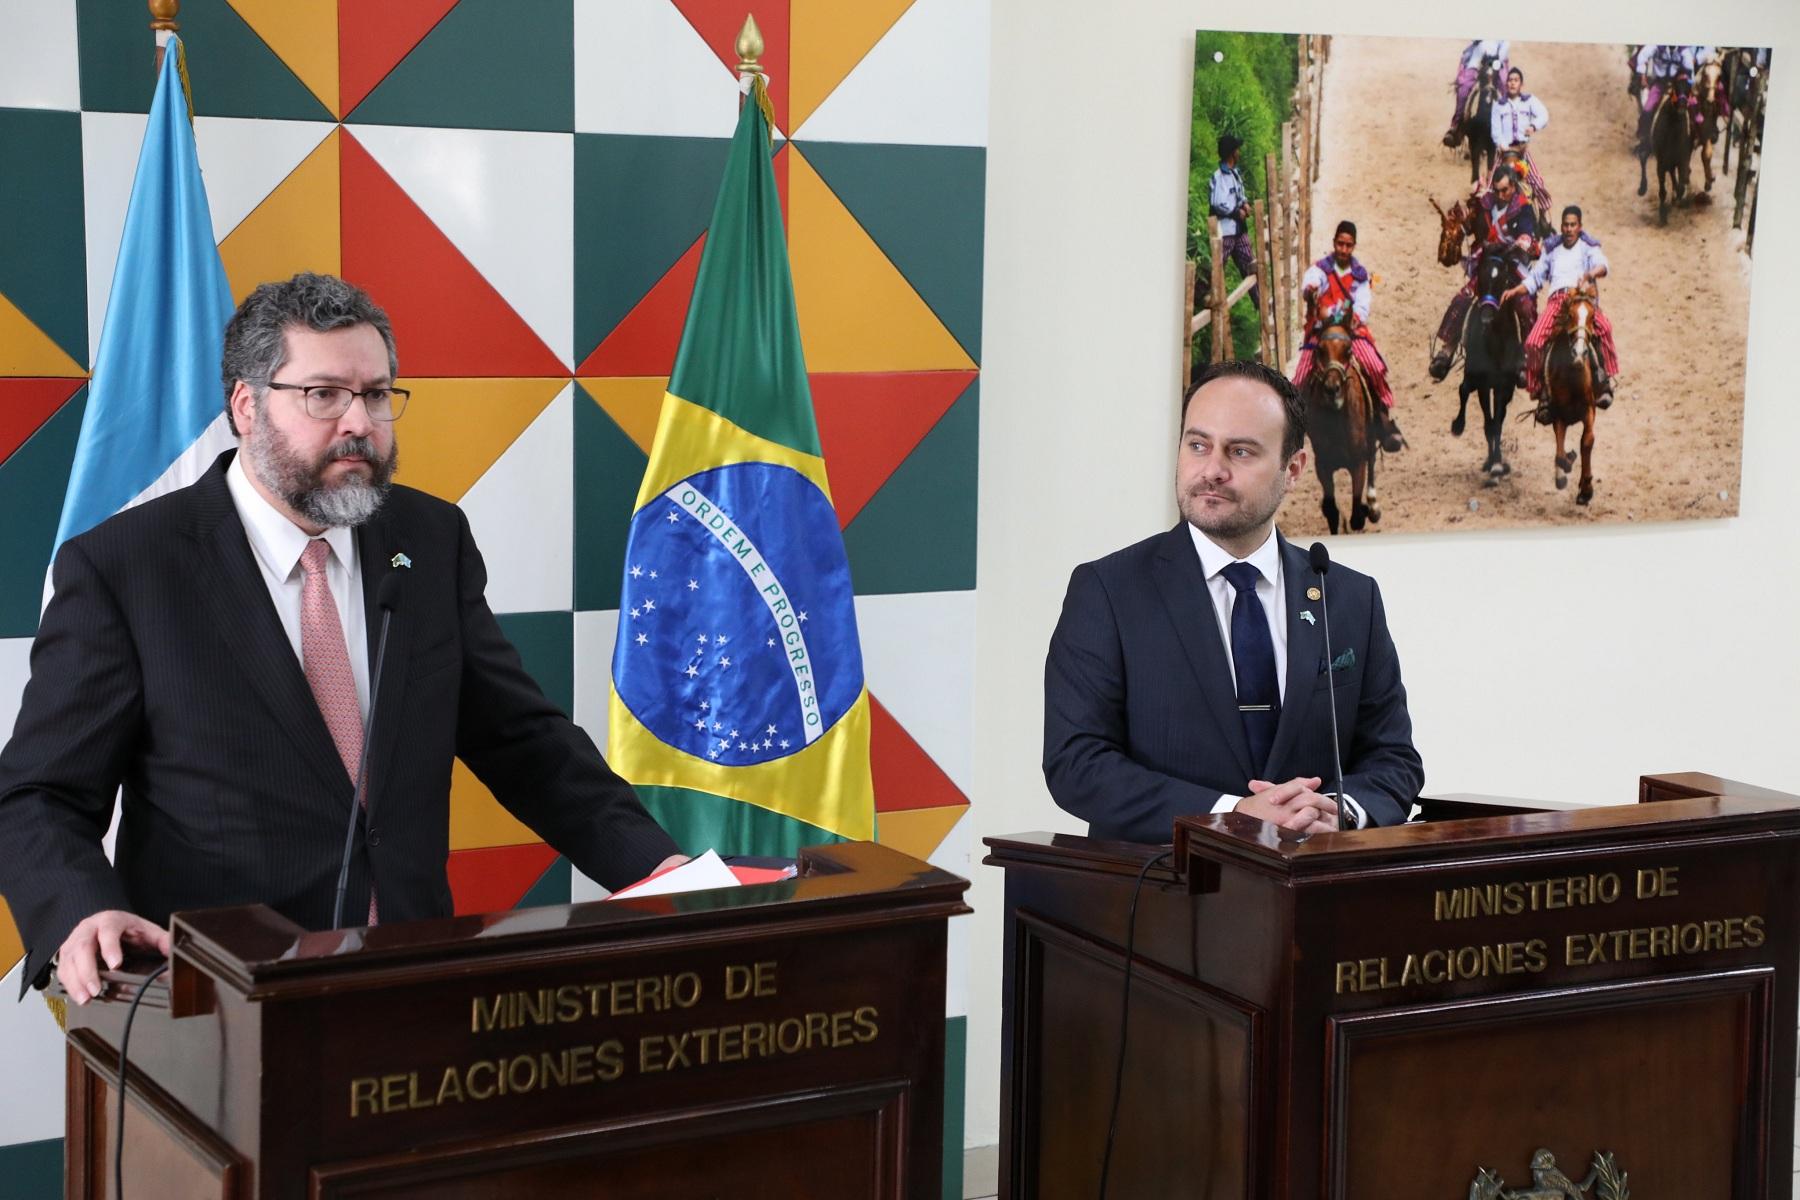 Grupo de Lima reclama apoyo internacional para Guaidó en Venezuela